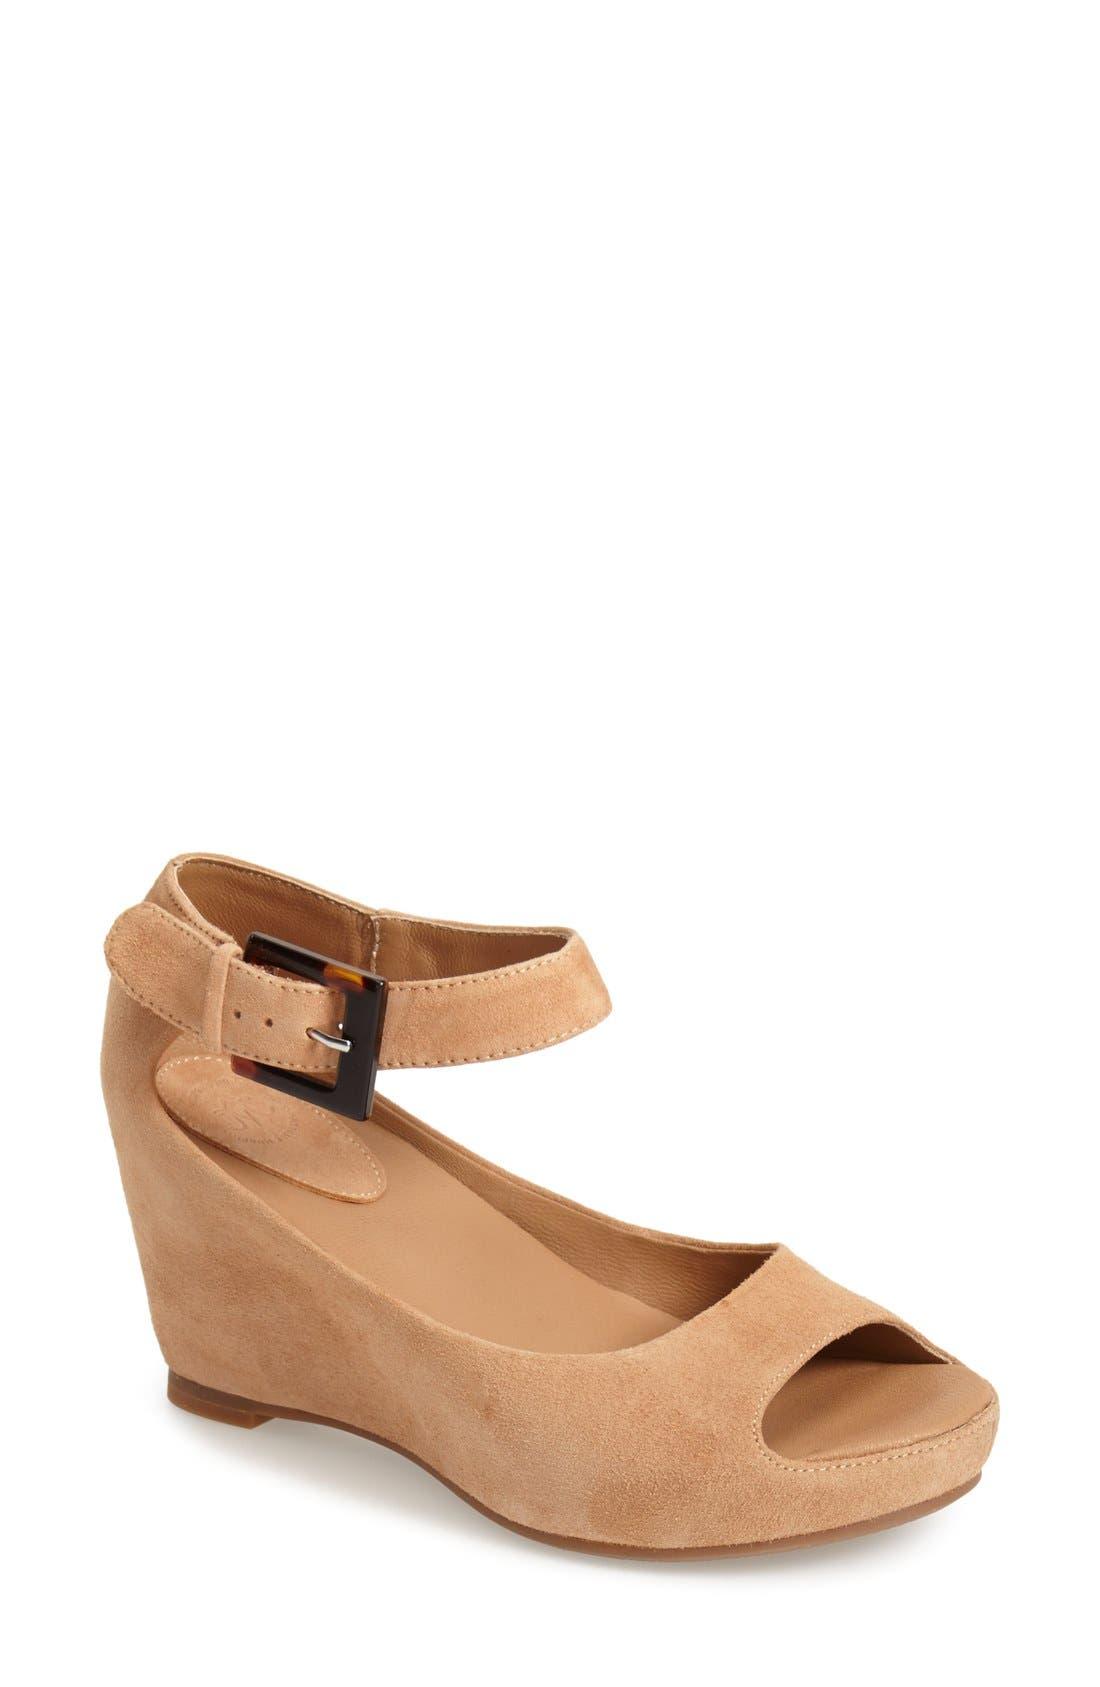 'Tricia' Ankle Strap Sandal,                             Main thumbnail 3, color,